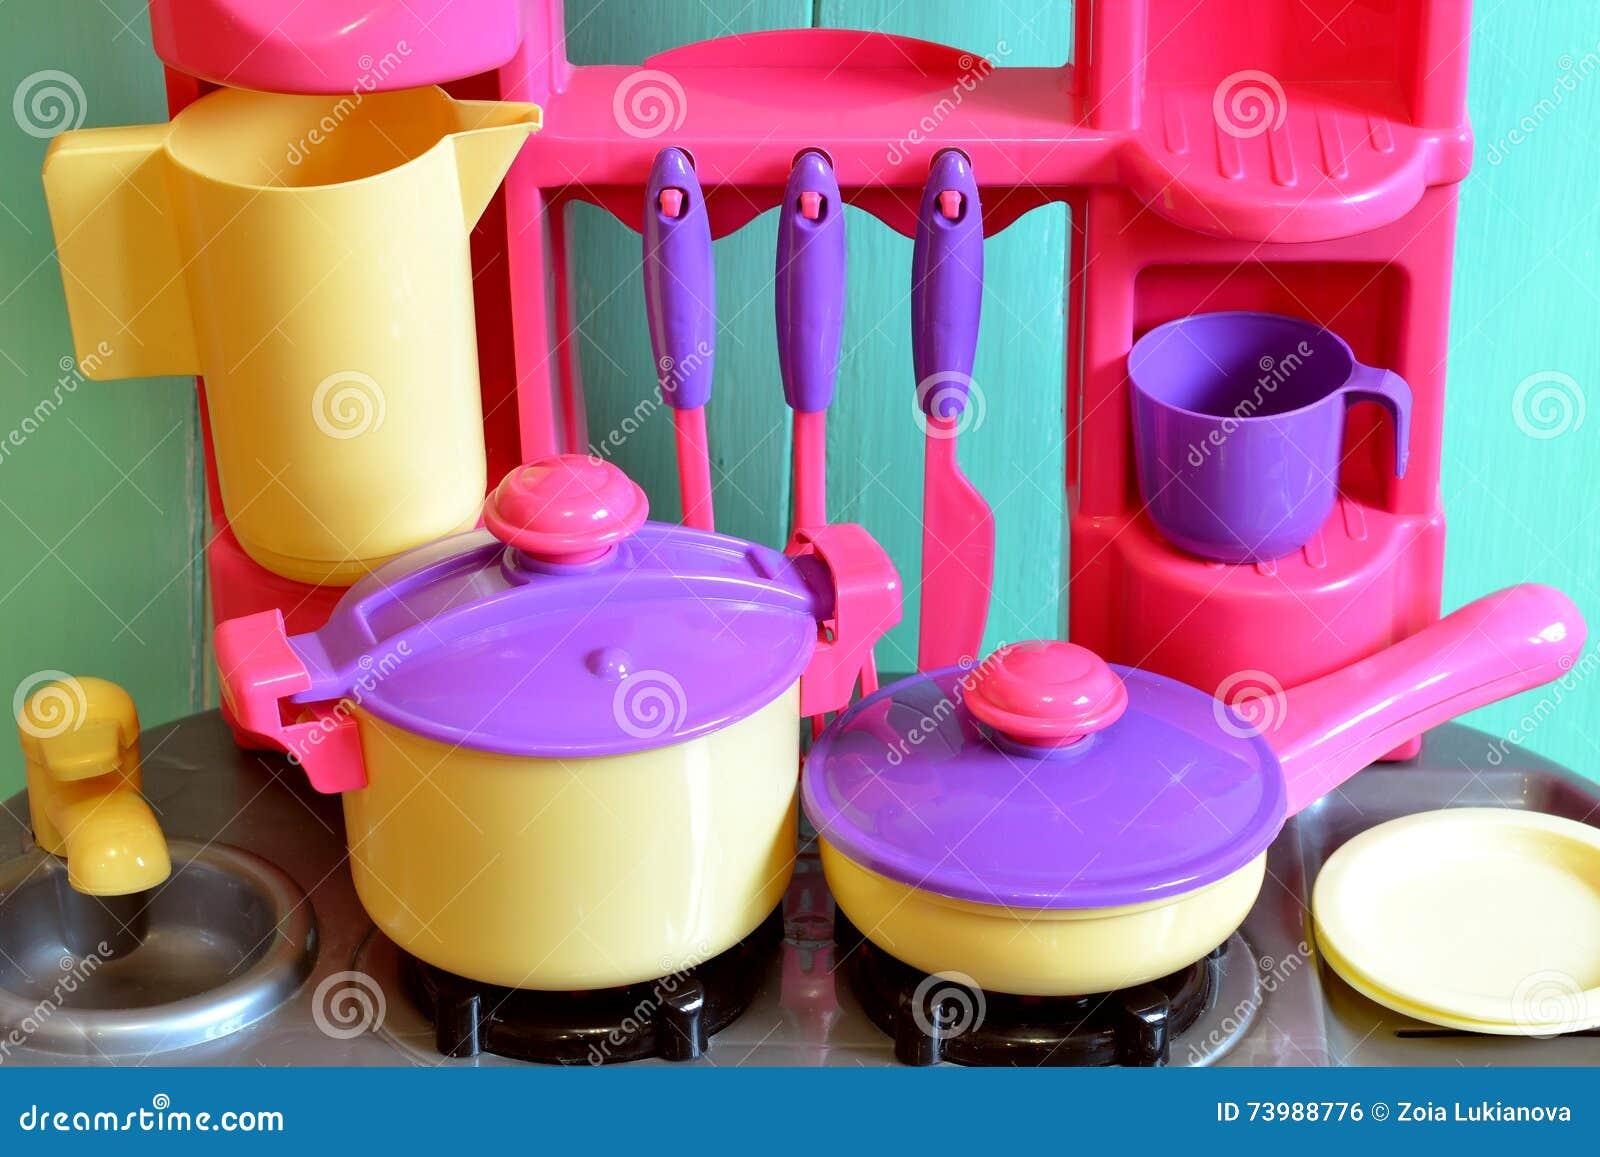 Set of kids dishes children 39 s toys kitchen utensils for Kitchen set games